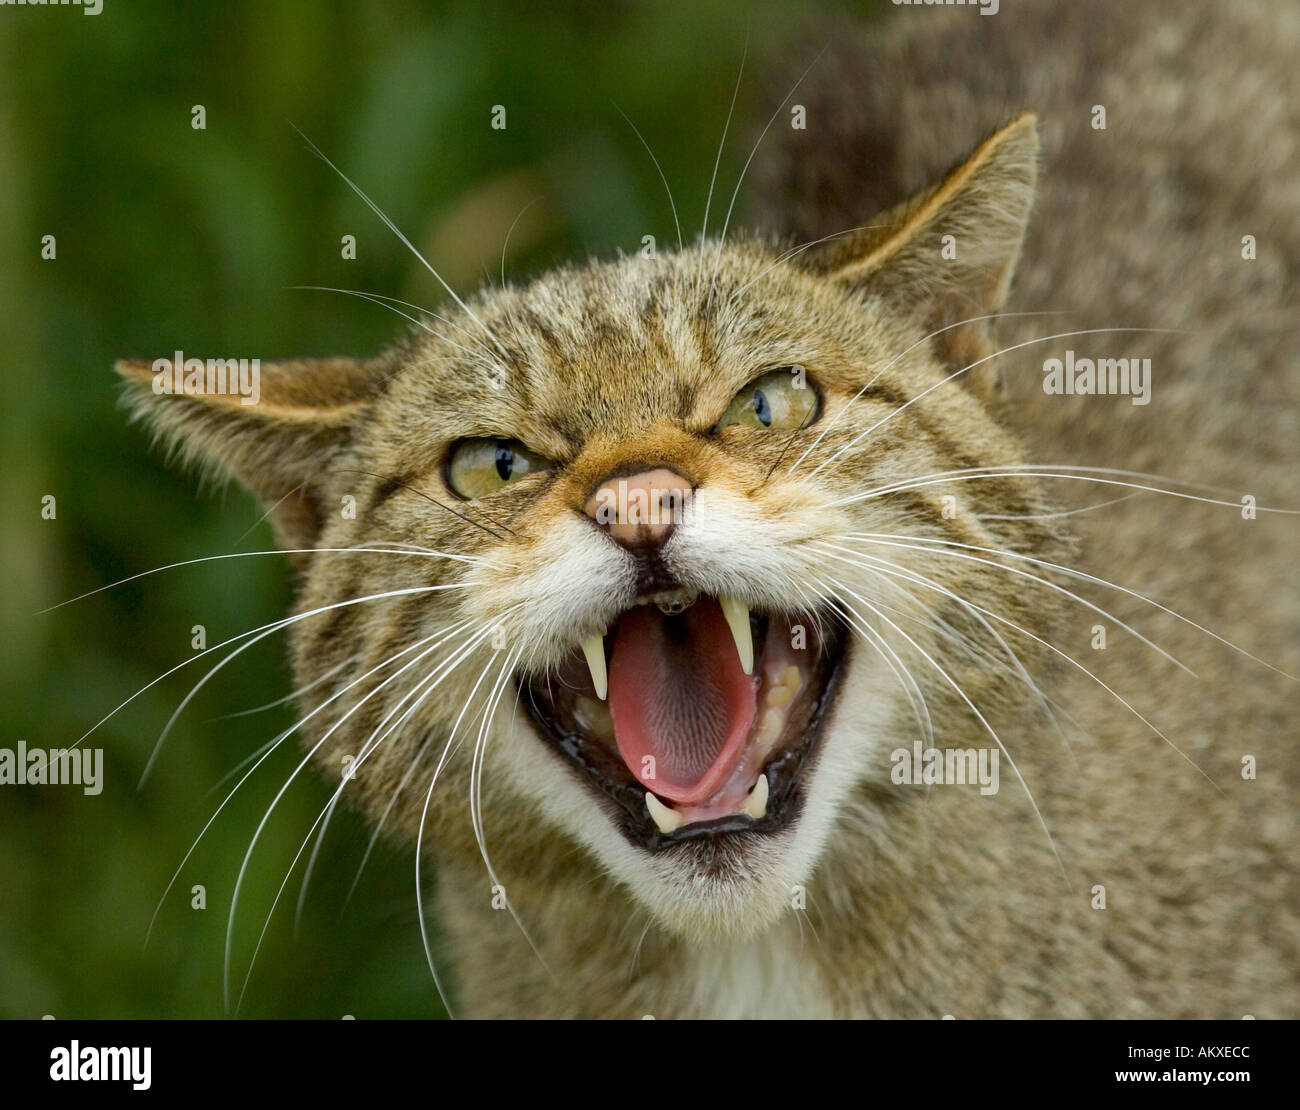 Scottish Wildcat Felis silvestris snarling Scotland - Stock Image